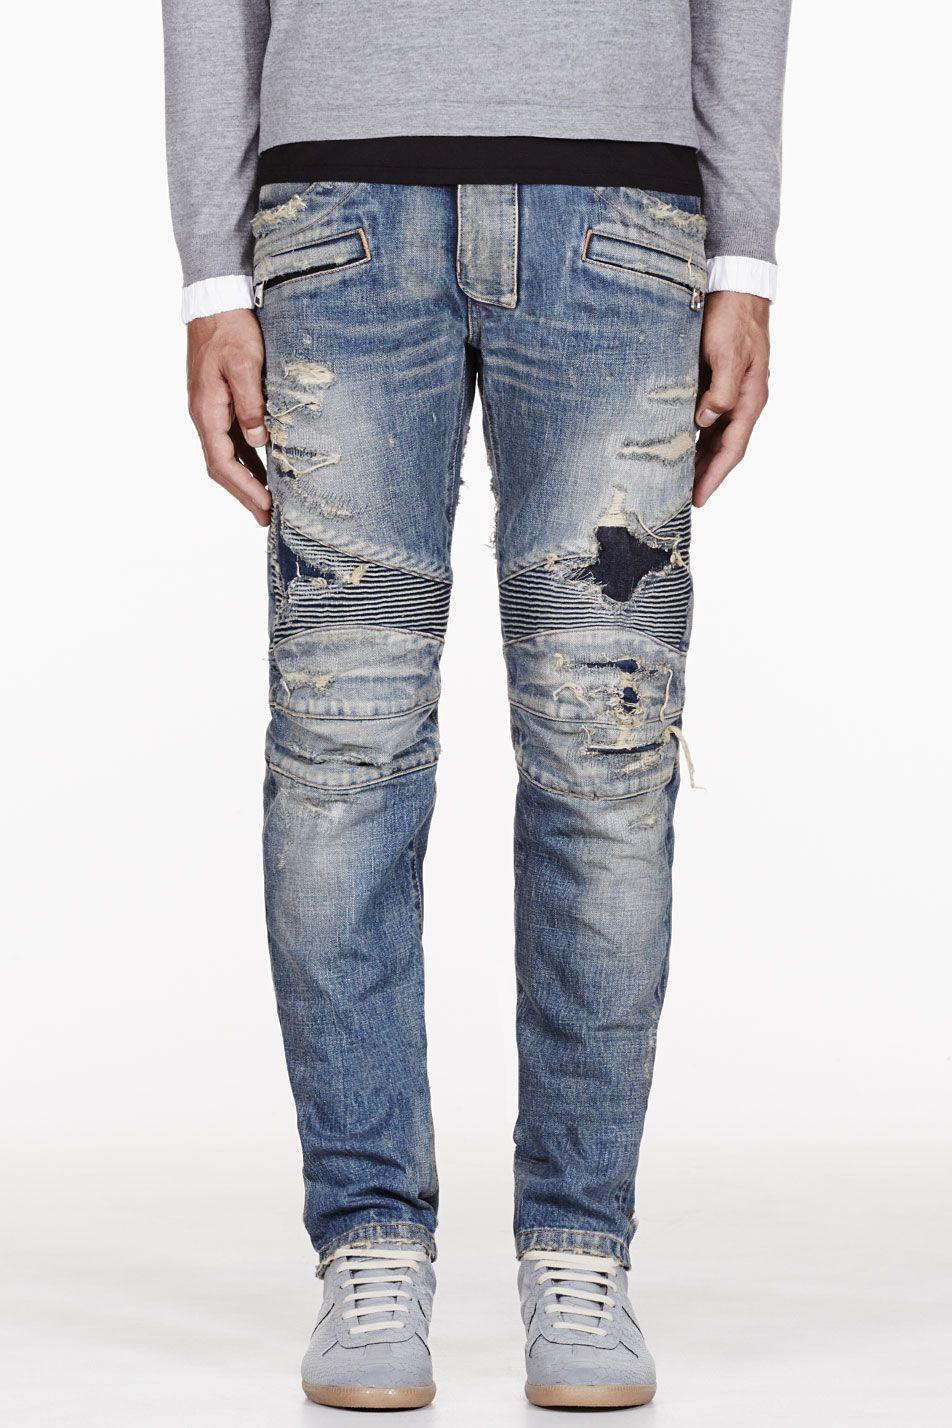 e5965499 BALMAIN Blue DESTROYED BIKER JEANS | Style | Biker jeans, Jeans ...